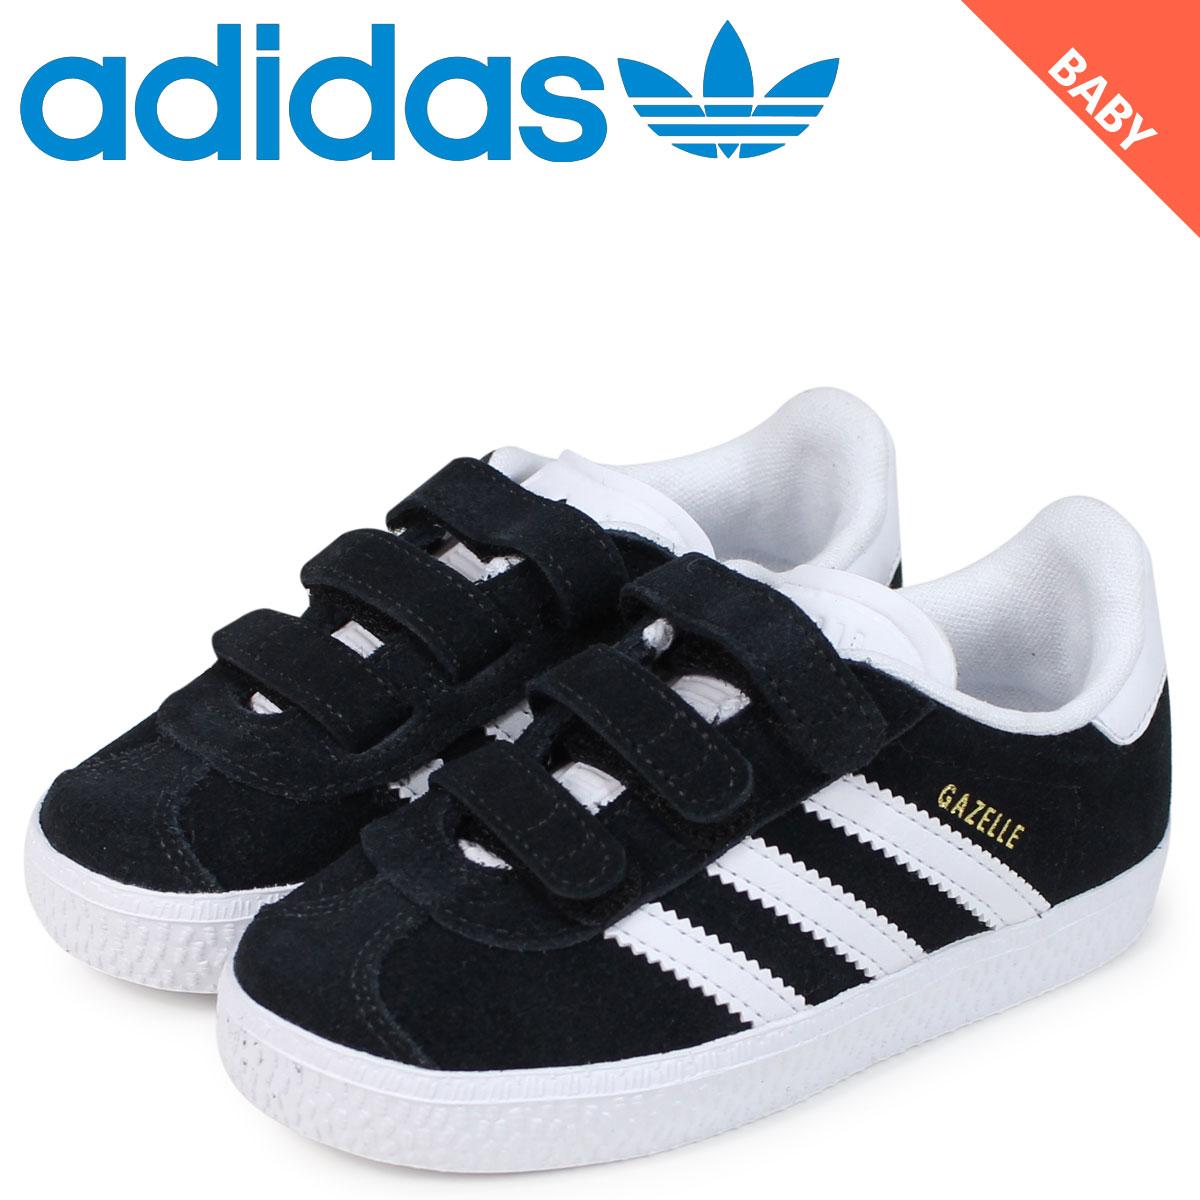 14e6b702f71 adidas Originals Adidas originals gazelle sneakers baby gut label black  GAZELLE CF I black black CG3139 ...